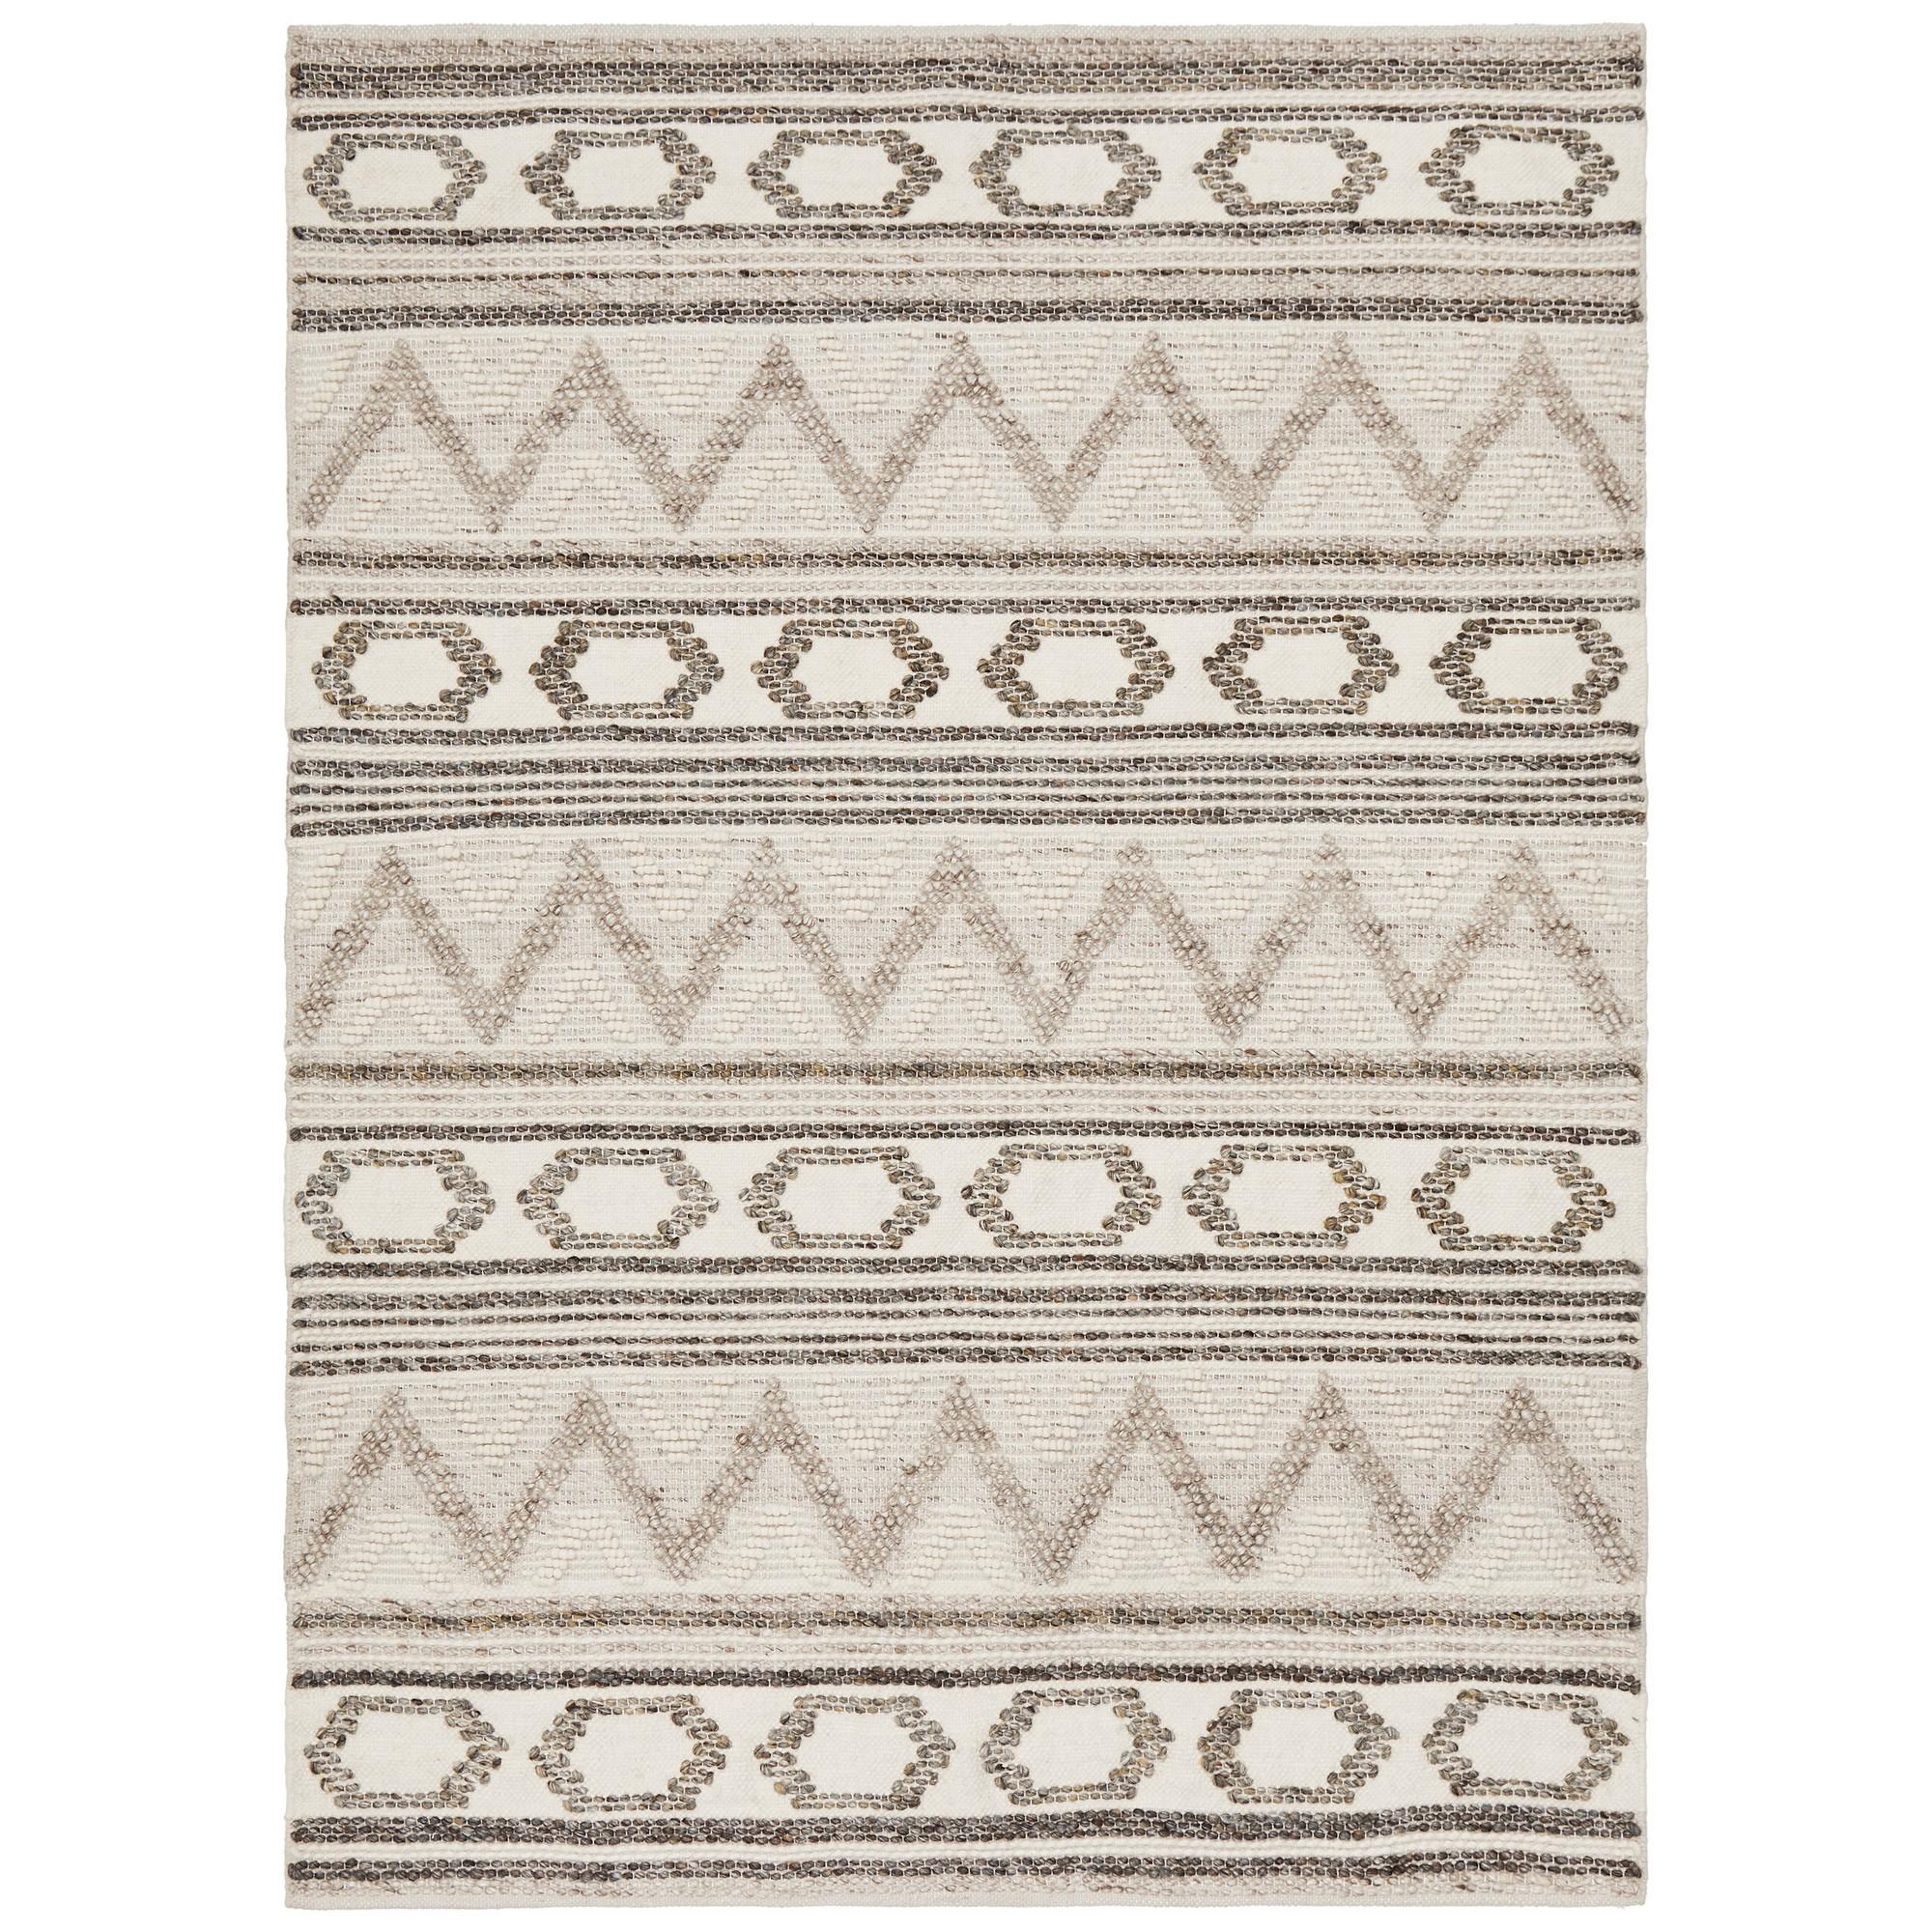 Rhythm Cronus Hand Loomed Wool Rug, 300x400cm